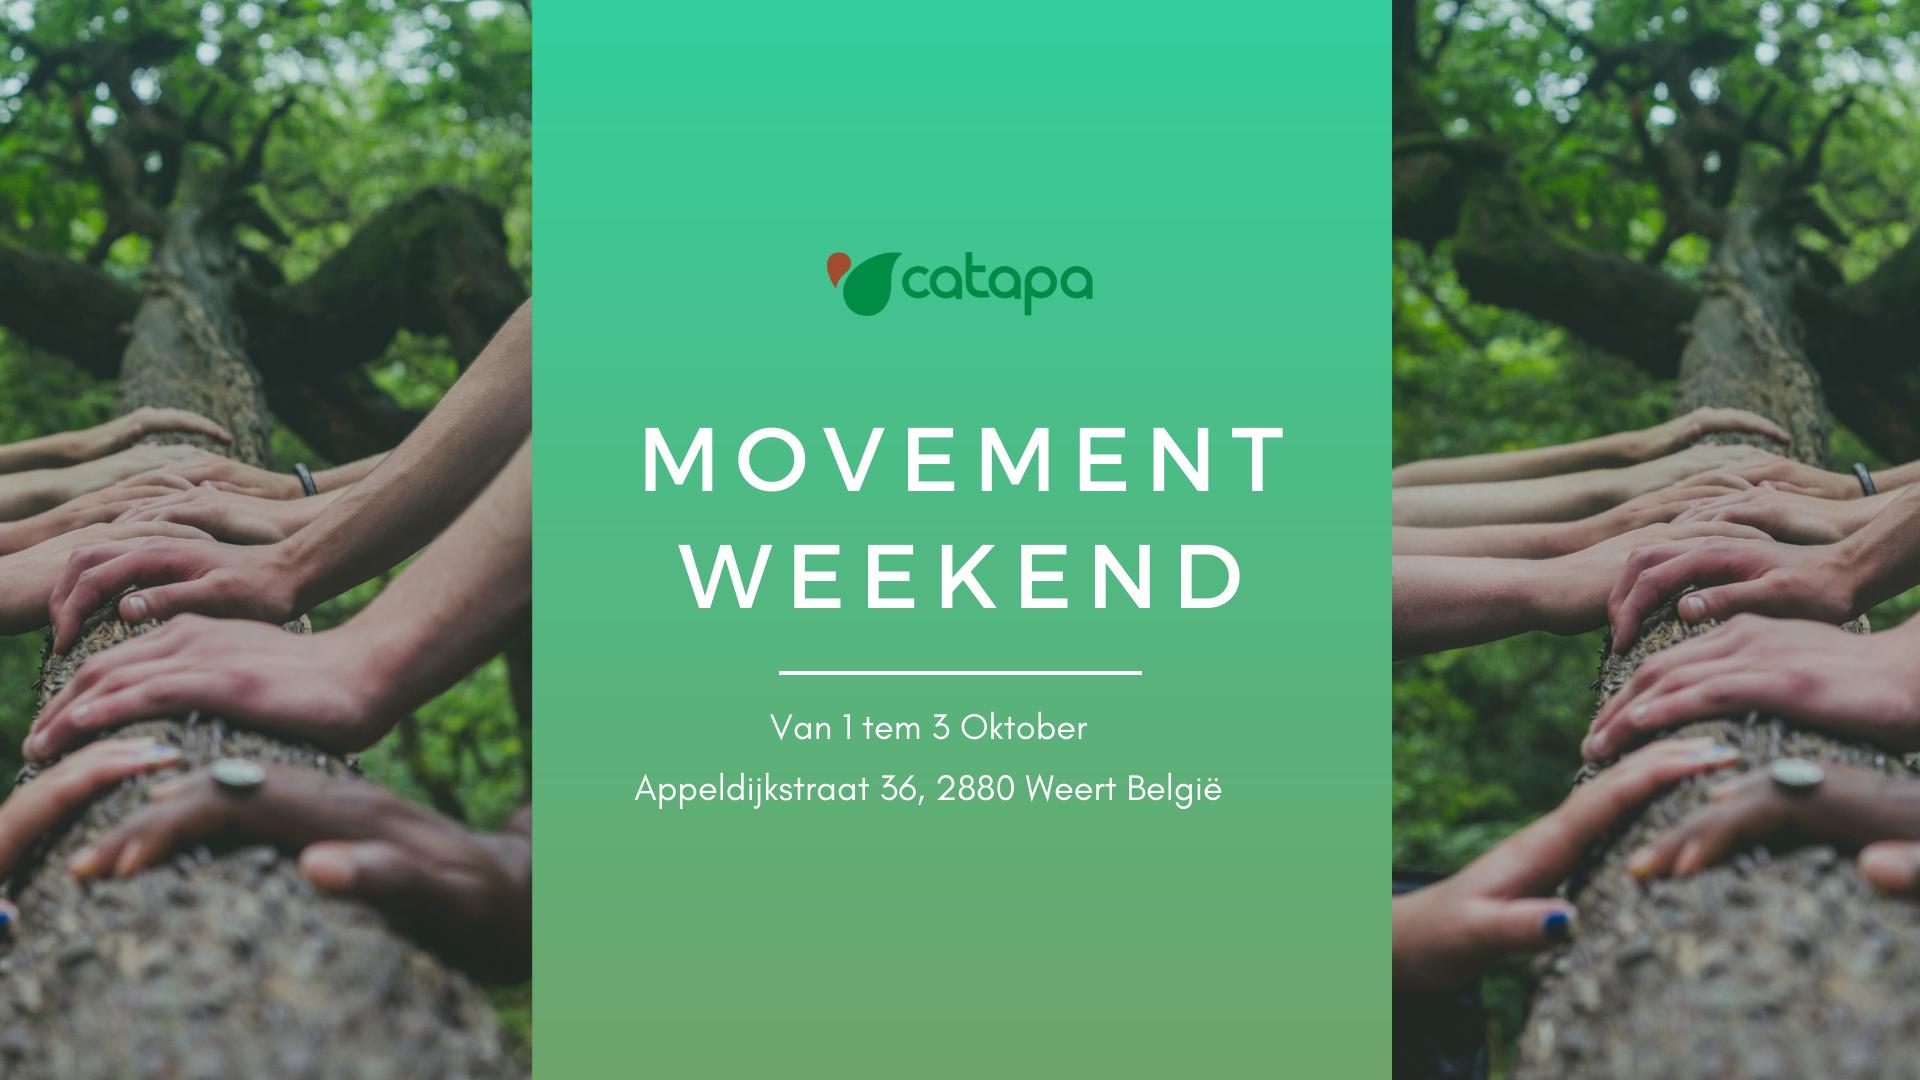 Catapa Movement Weekend